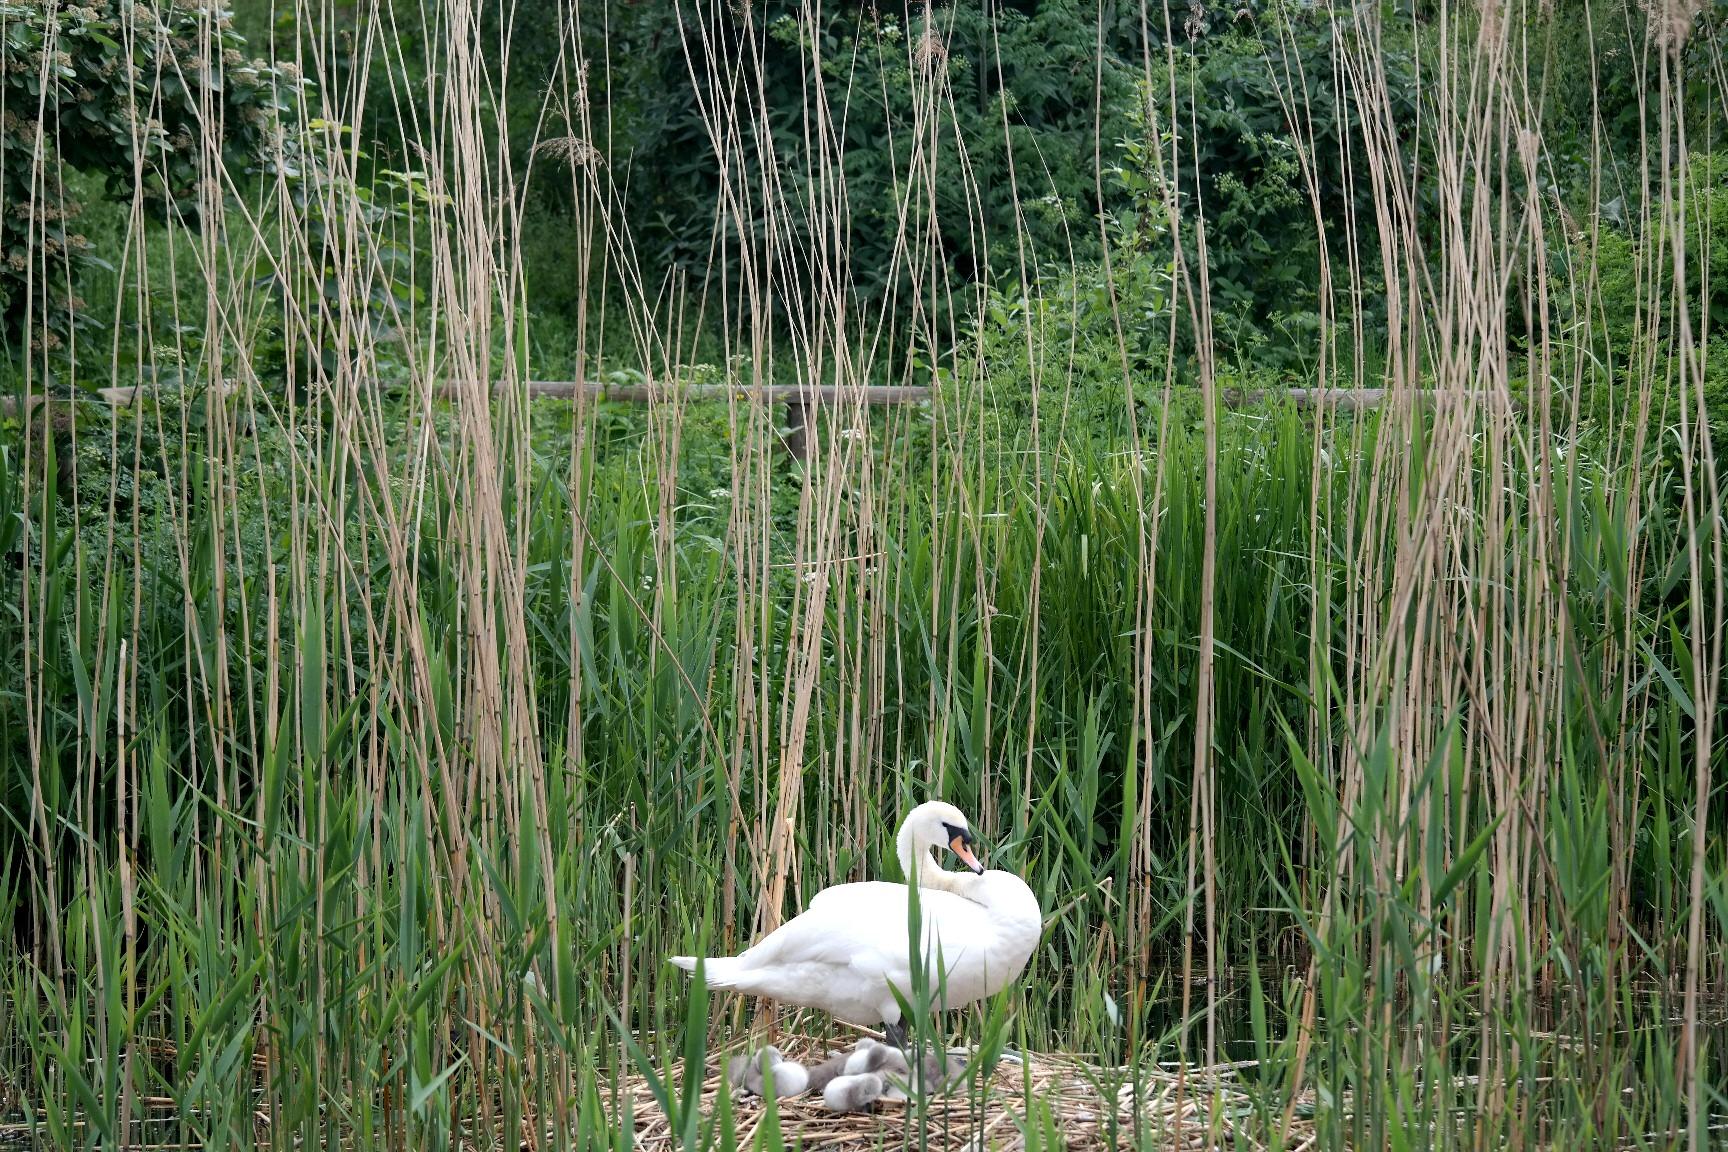 a swans nest